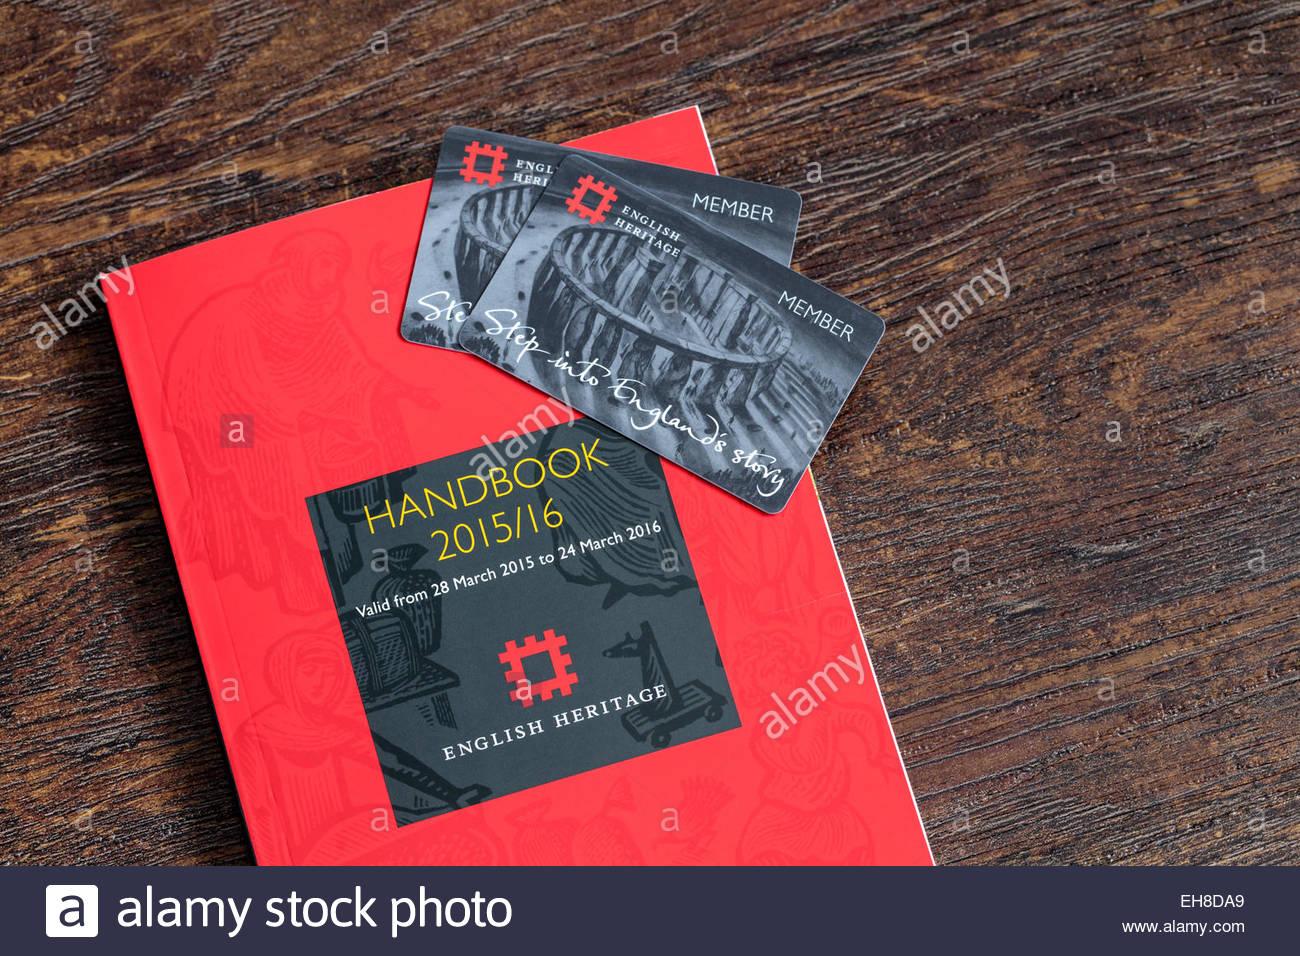 English Heritage Membership Cards and Handbook - Stock Image